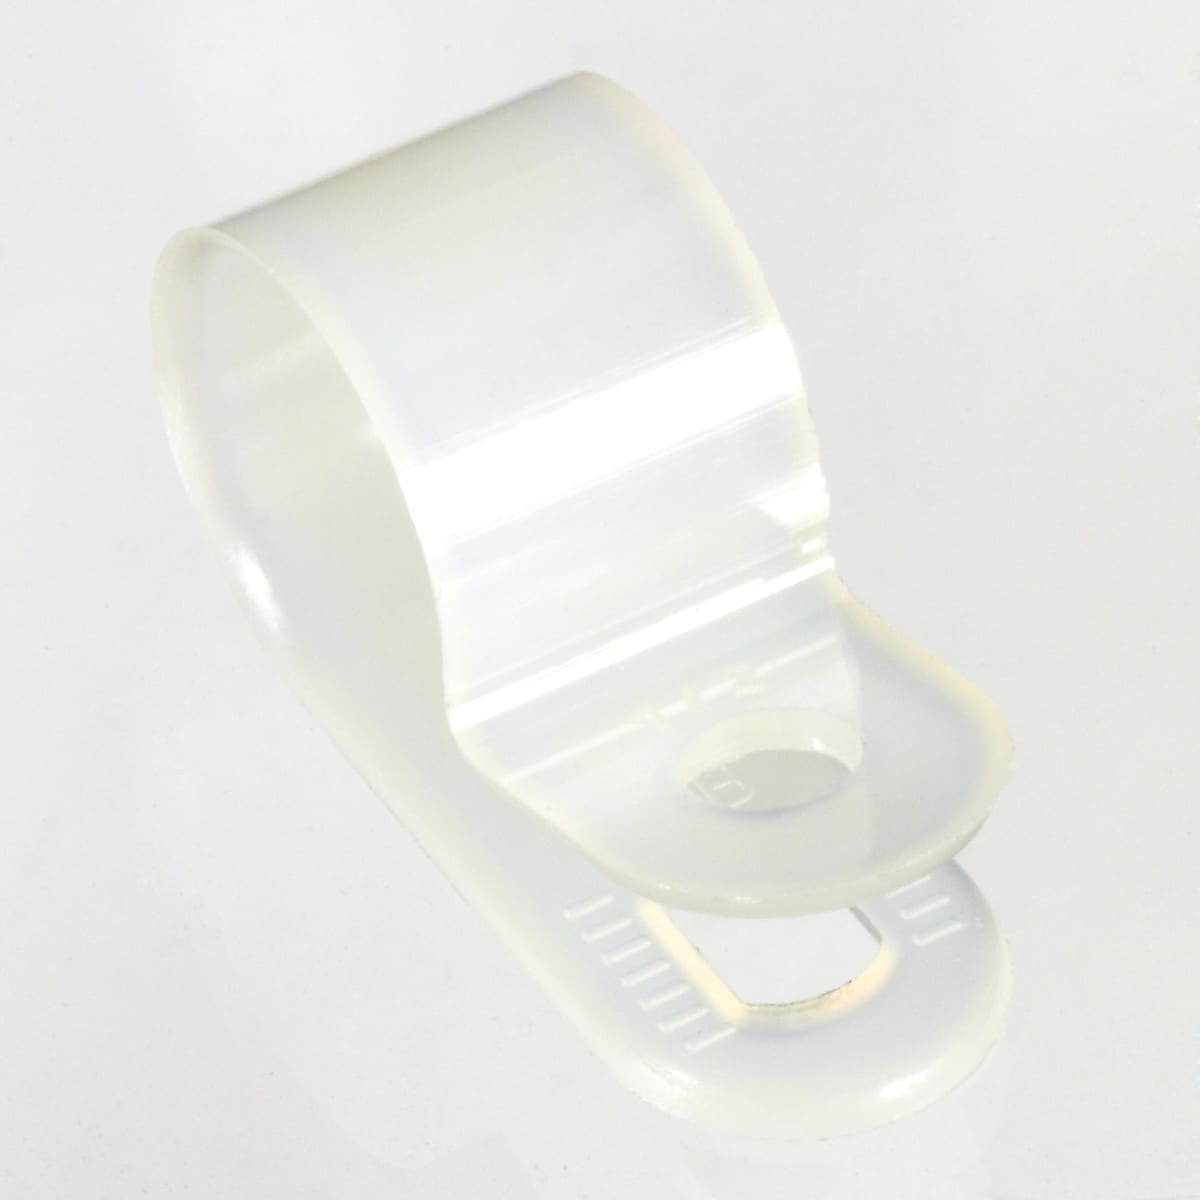 Kunststoffclips